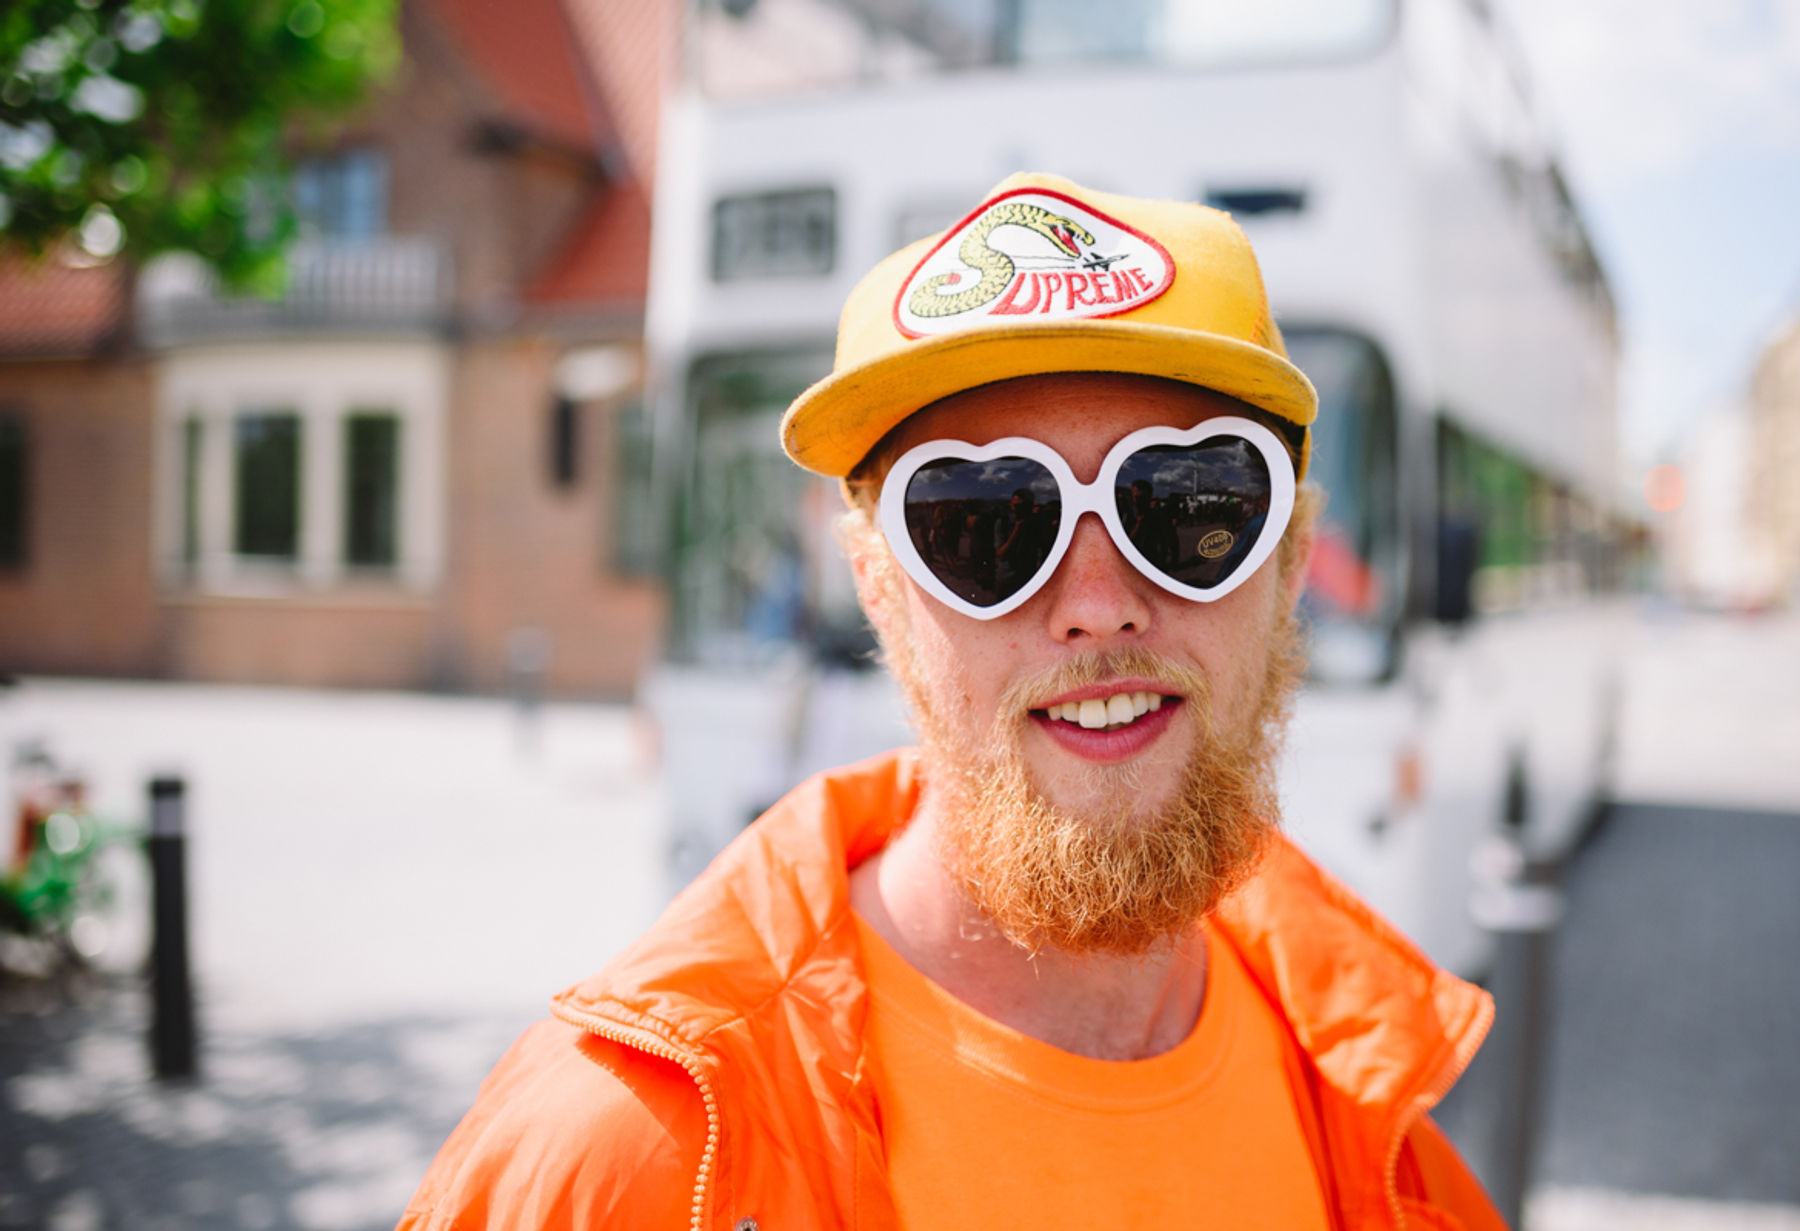 _IHC5548e-Nike-SB-Copenhagen-Open-Day-4-July-2015-Photographer-Maksim-Kalanep